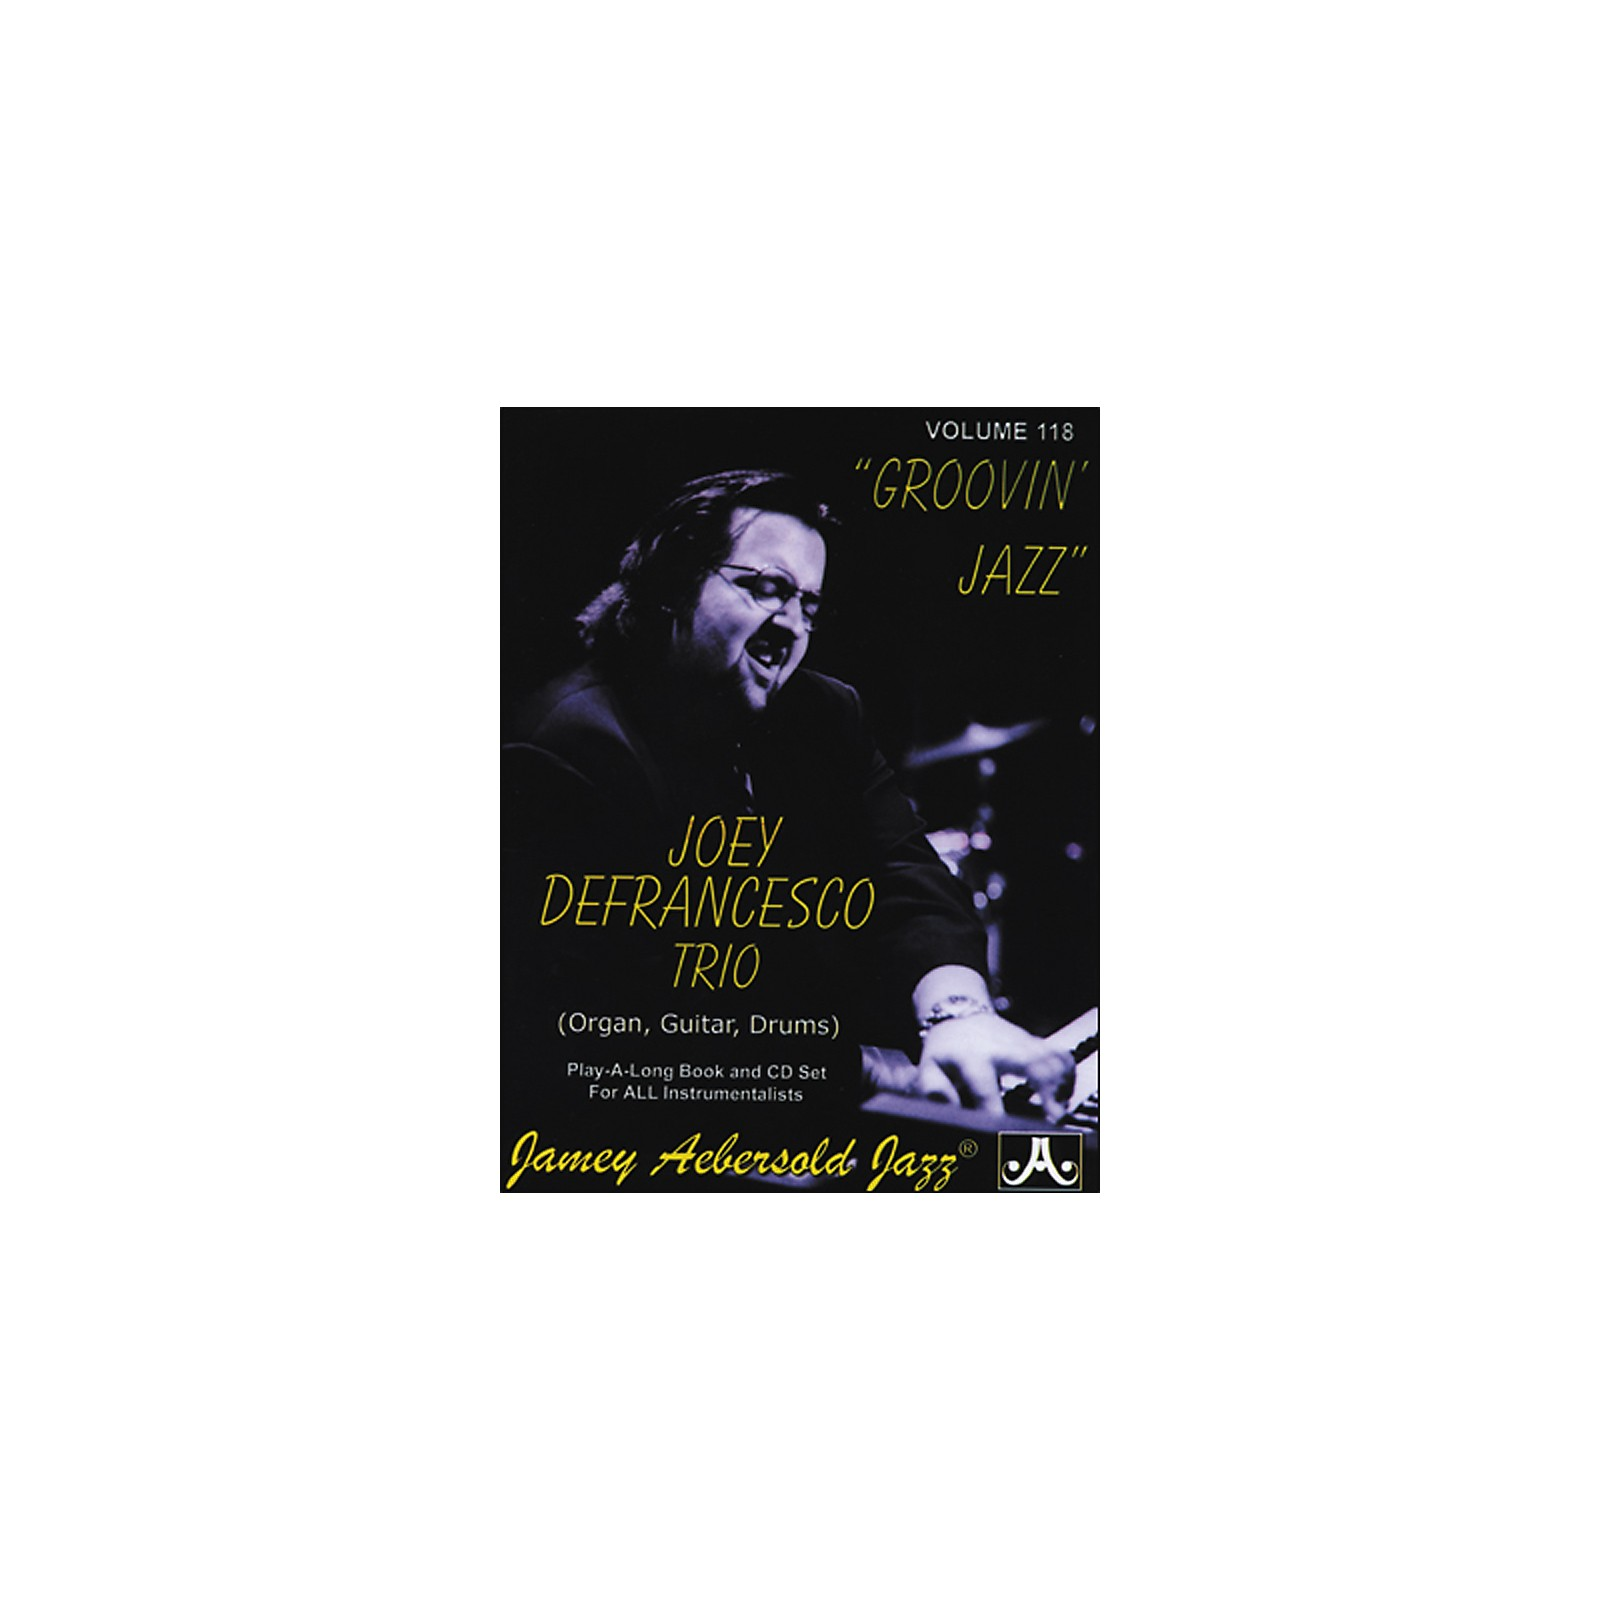 Jamey Aebersold Joey Defrancesco Groovin' Jazz Play-Along Book and CD